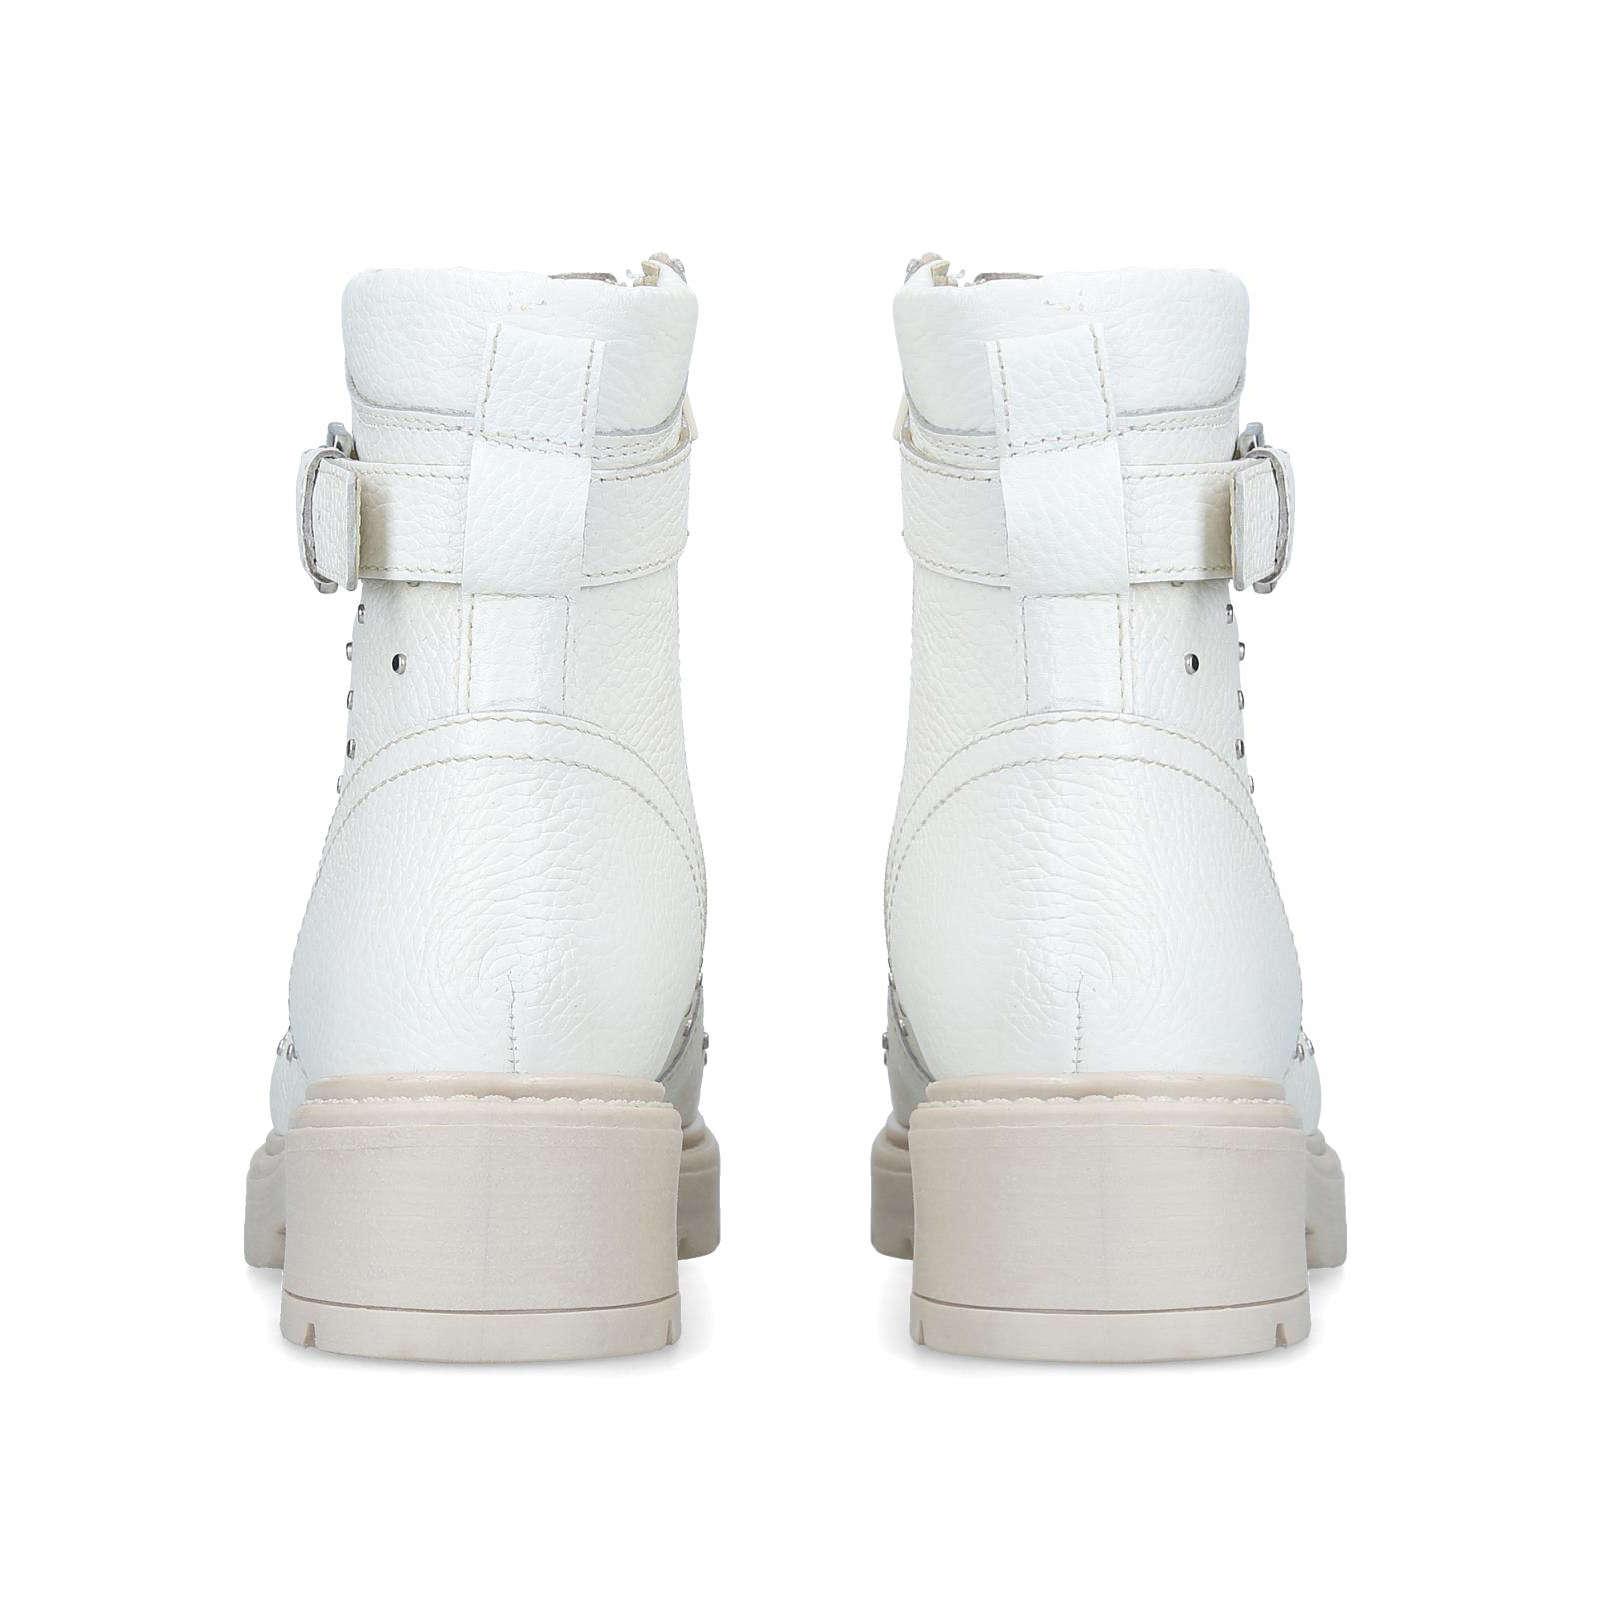 SHIVER - CARVELA Ankle Boots